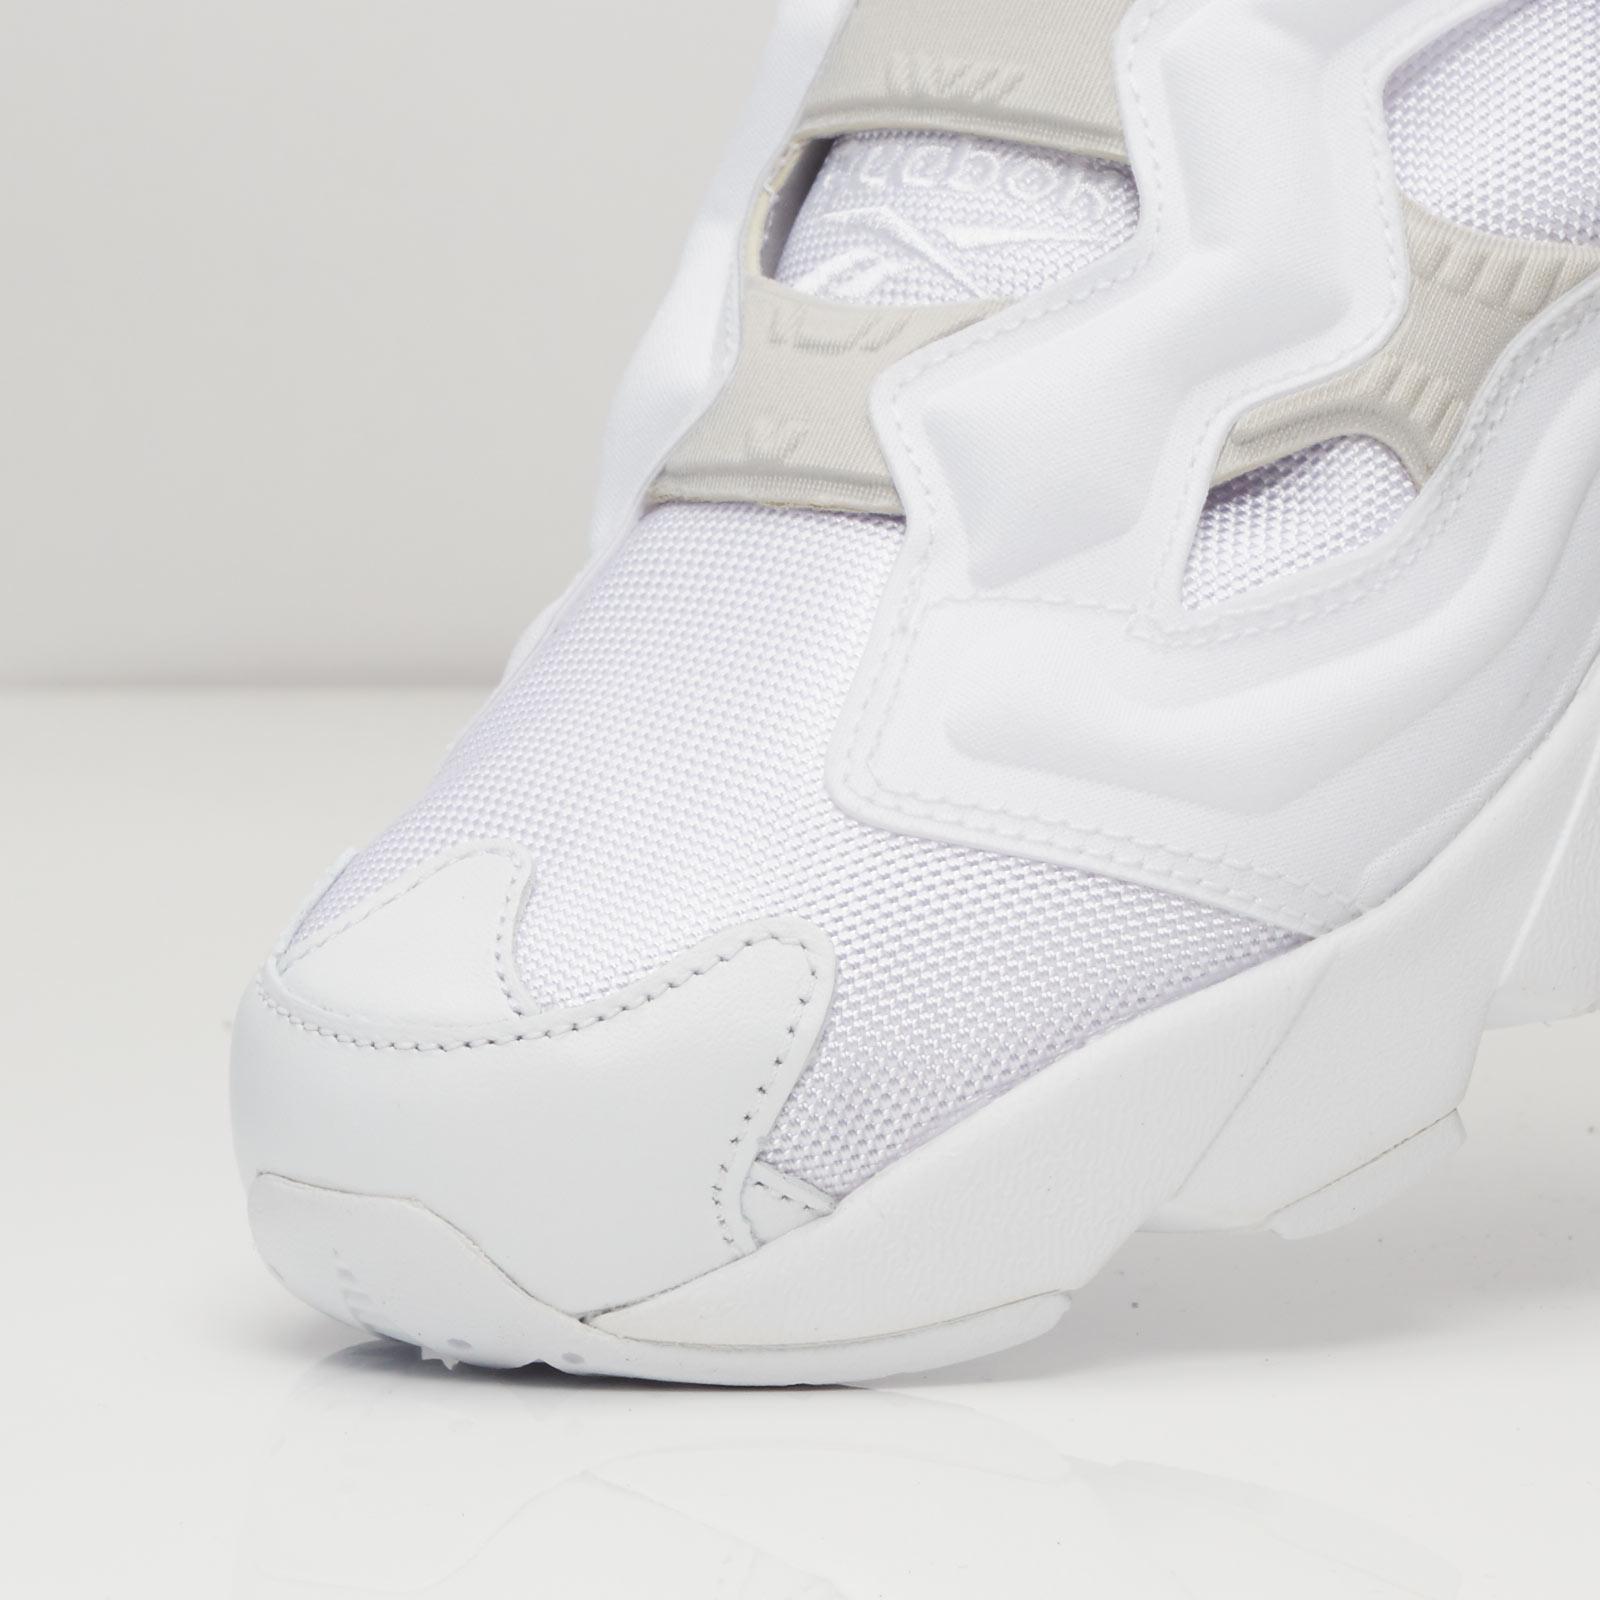 399c0a6e1d48 Reebok Instapump Fury OG - Ar2199 - Sneakersnstuff